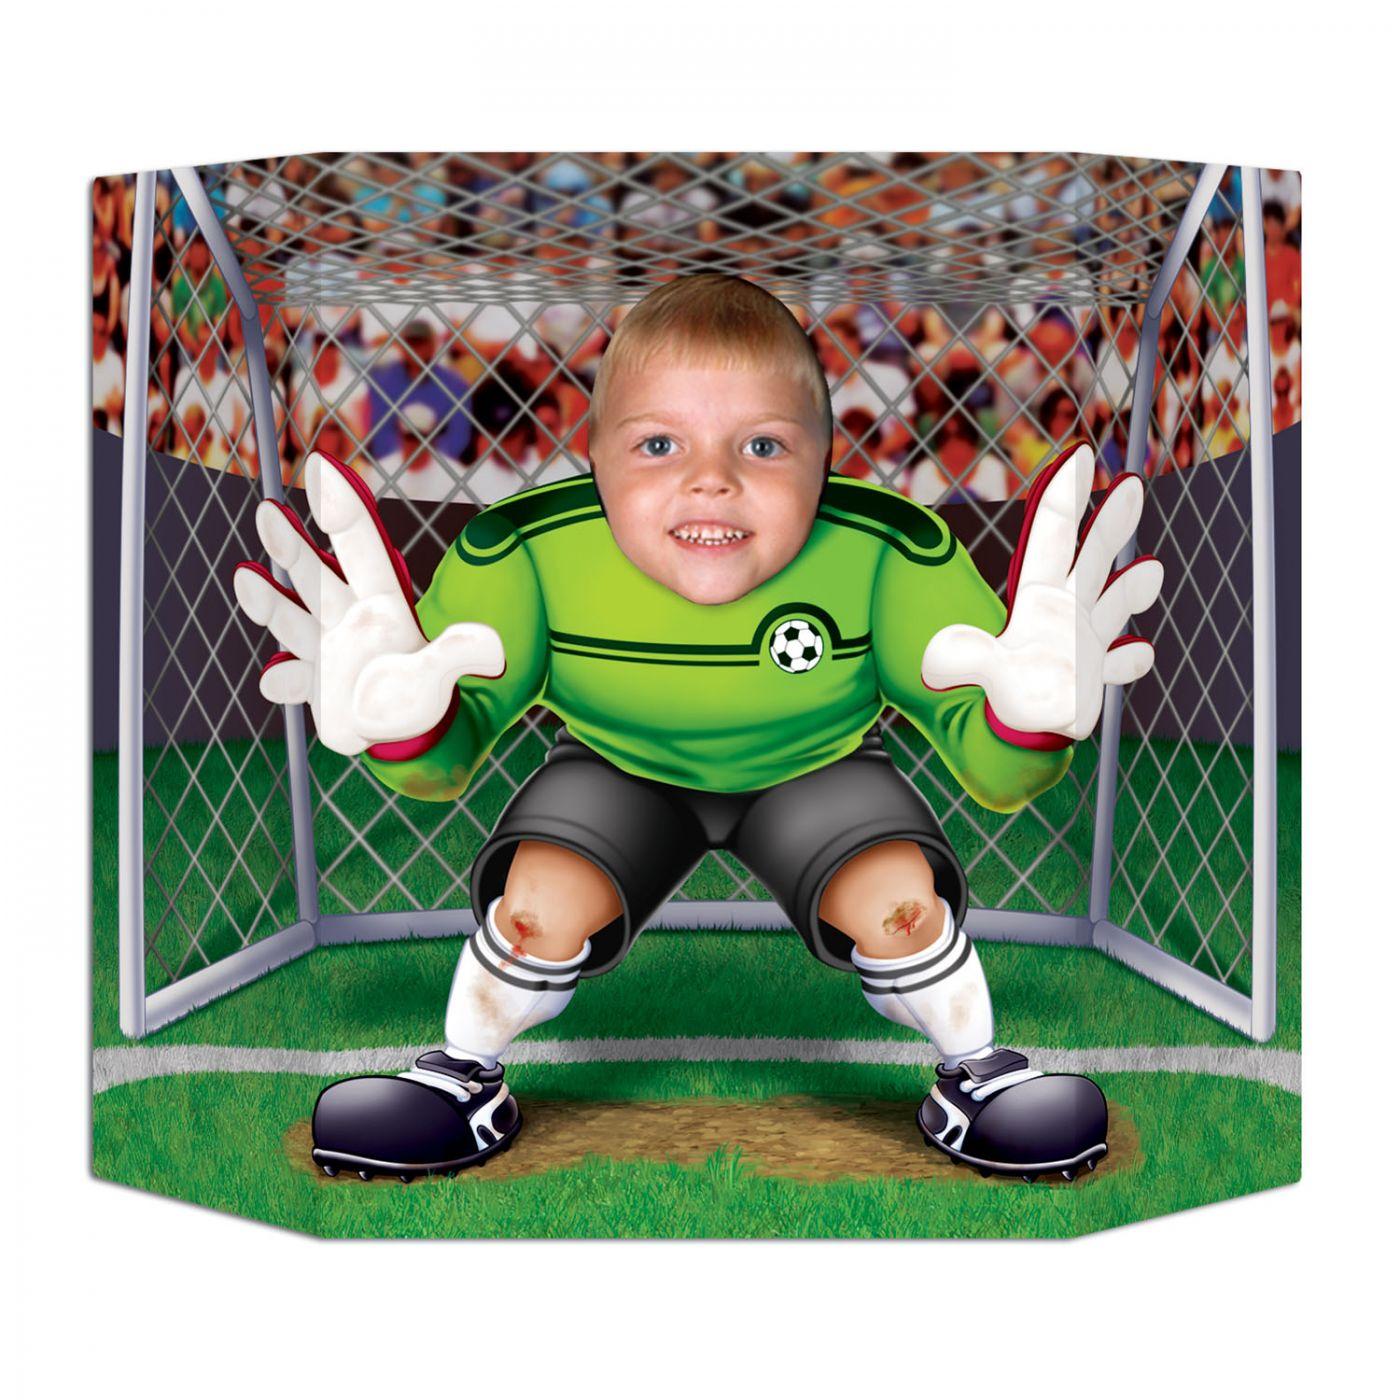 Soccer Photo Prop (6) image